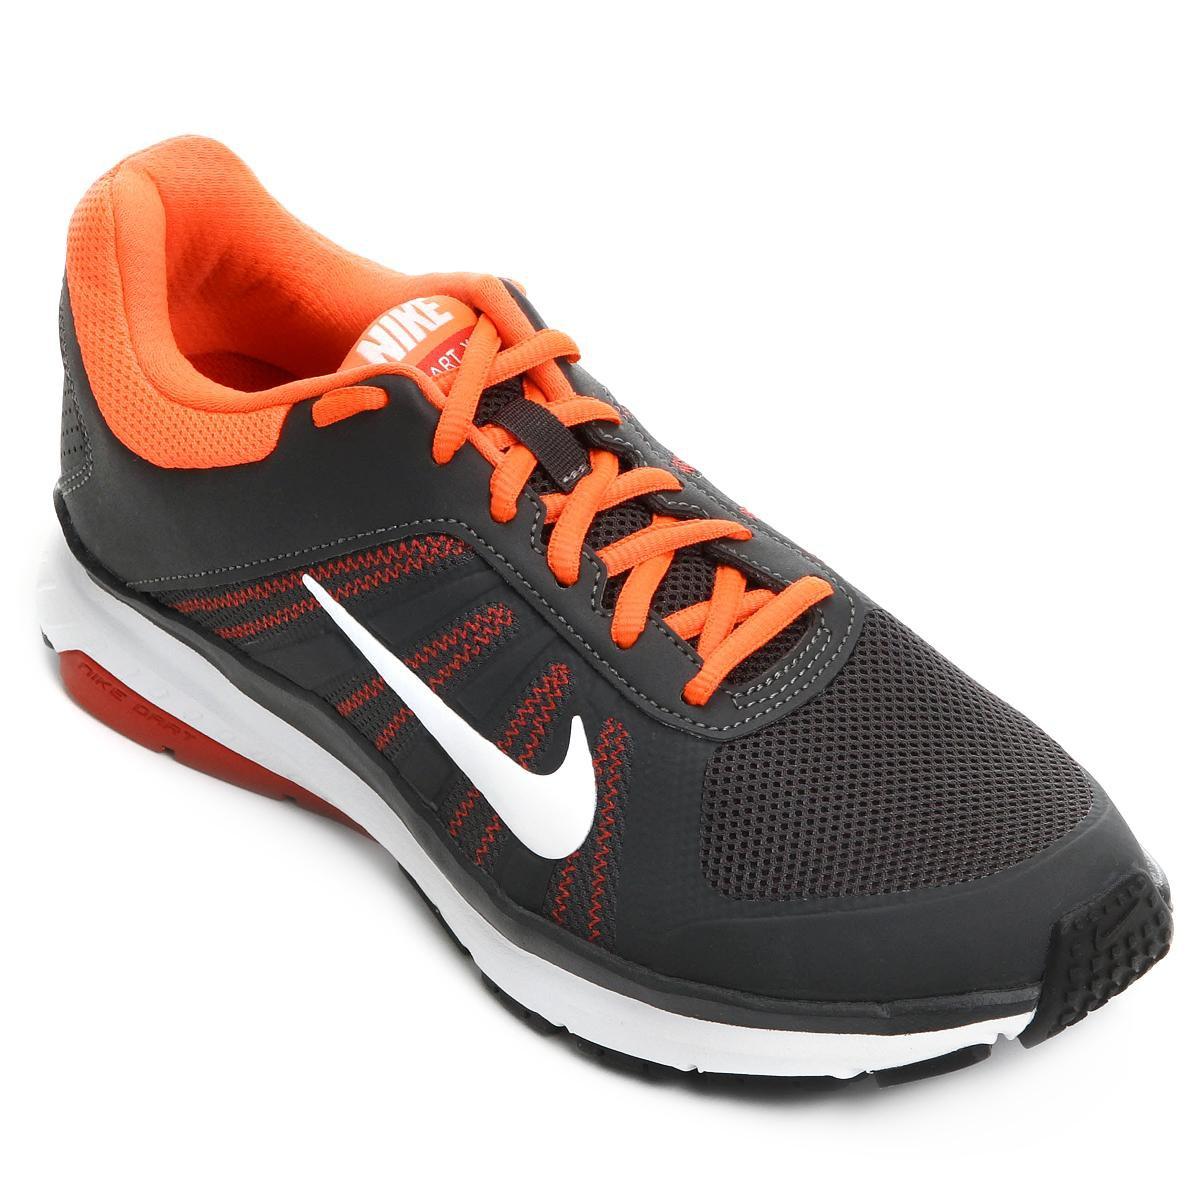 59fc2578b82 Tênis Nike Dart 12 MSL Masculino - Chumbo e Laranja - Compre Agora ...